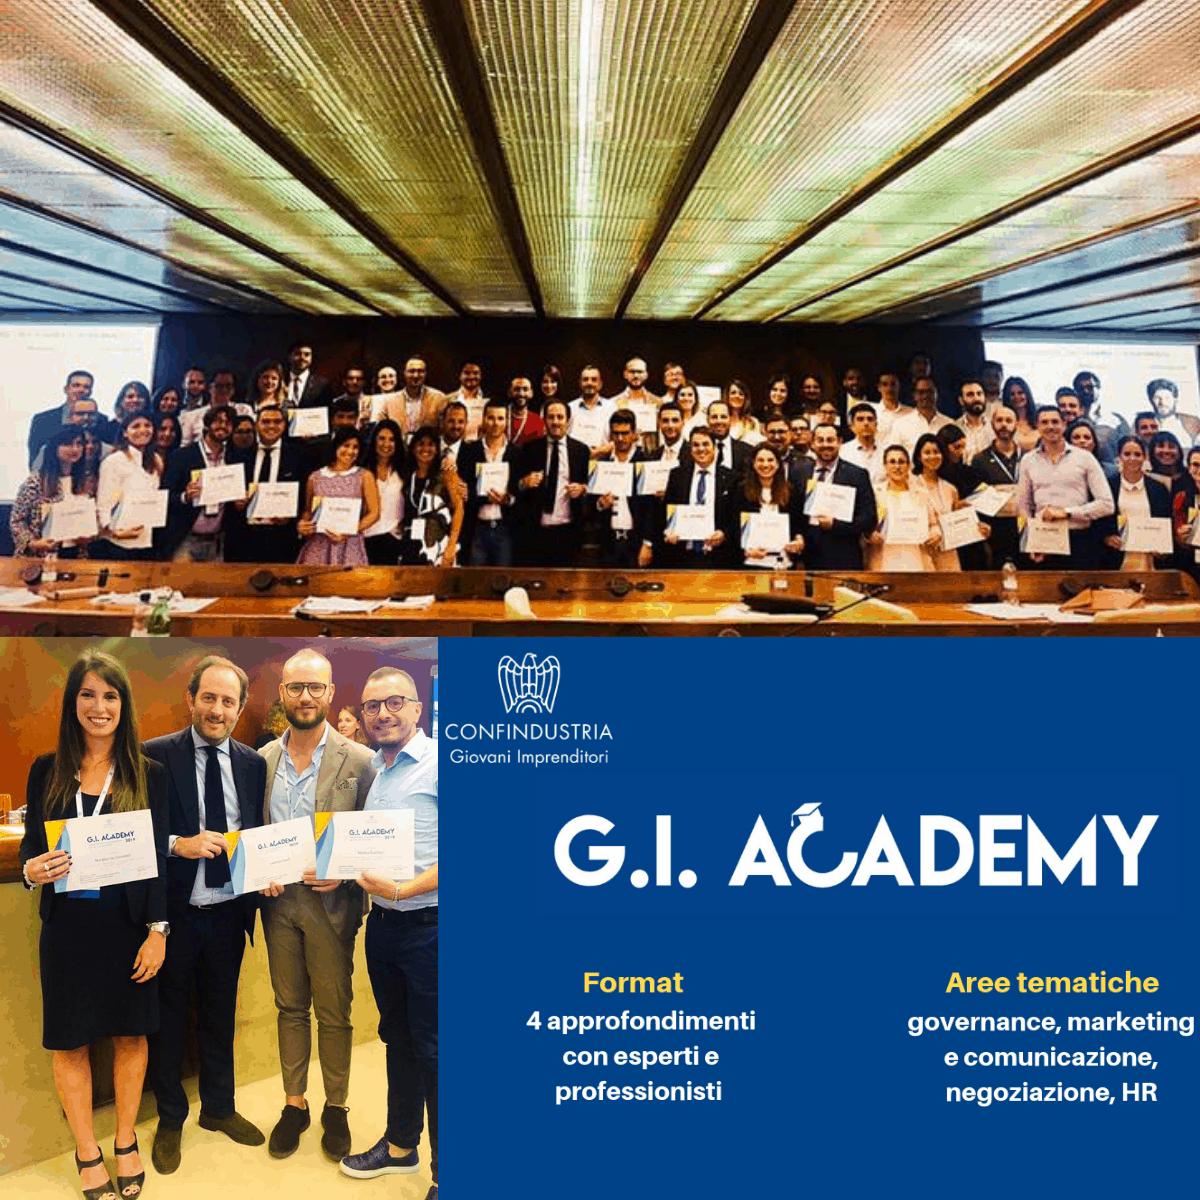 G.I. Academy Confindustria